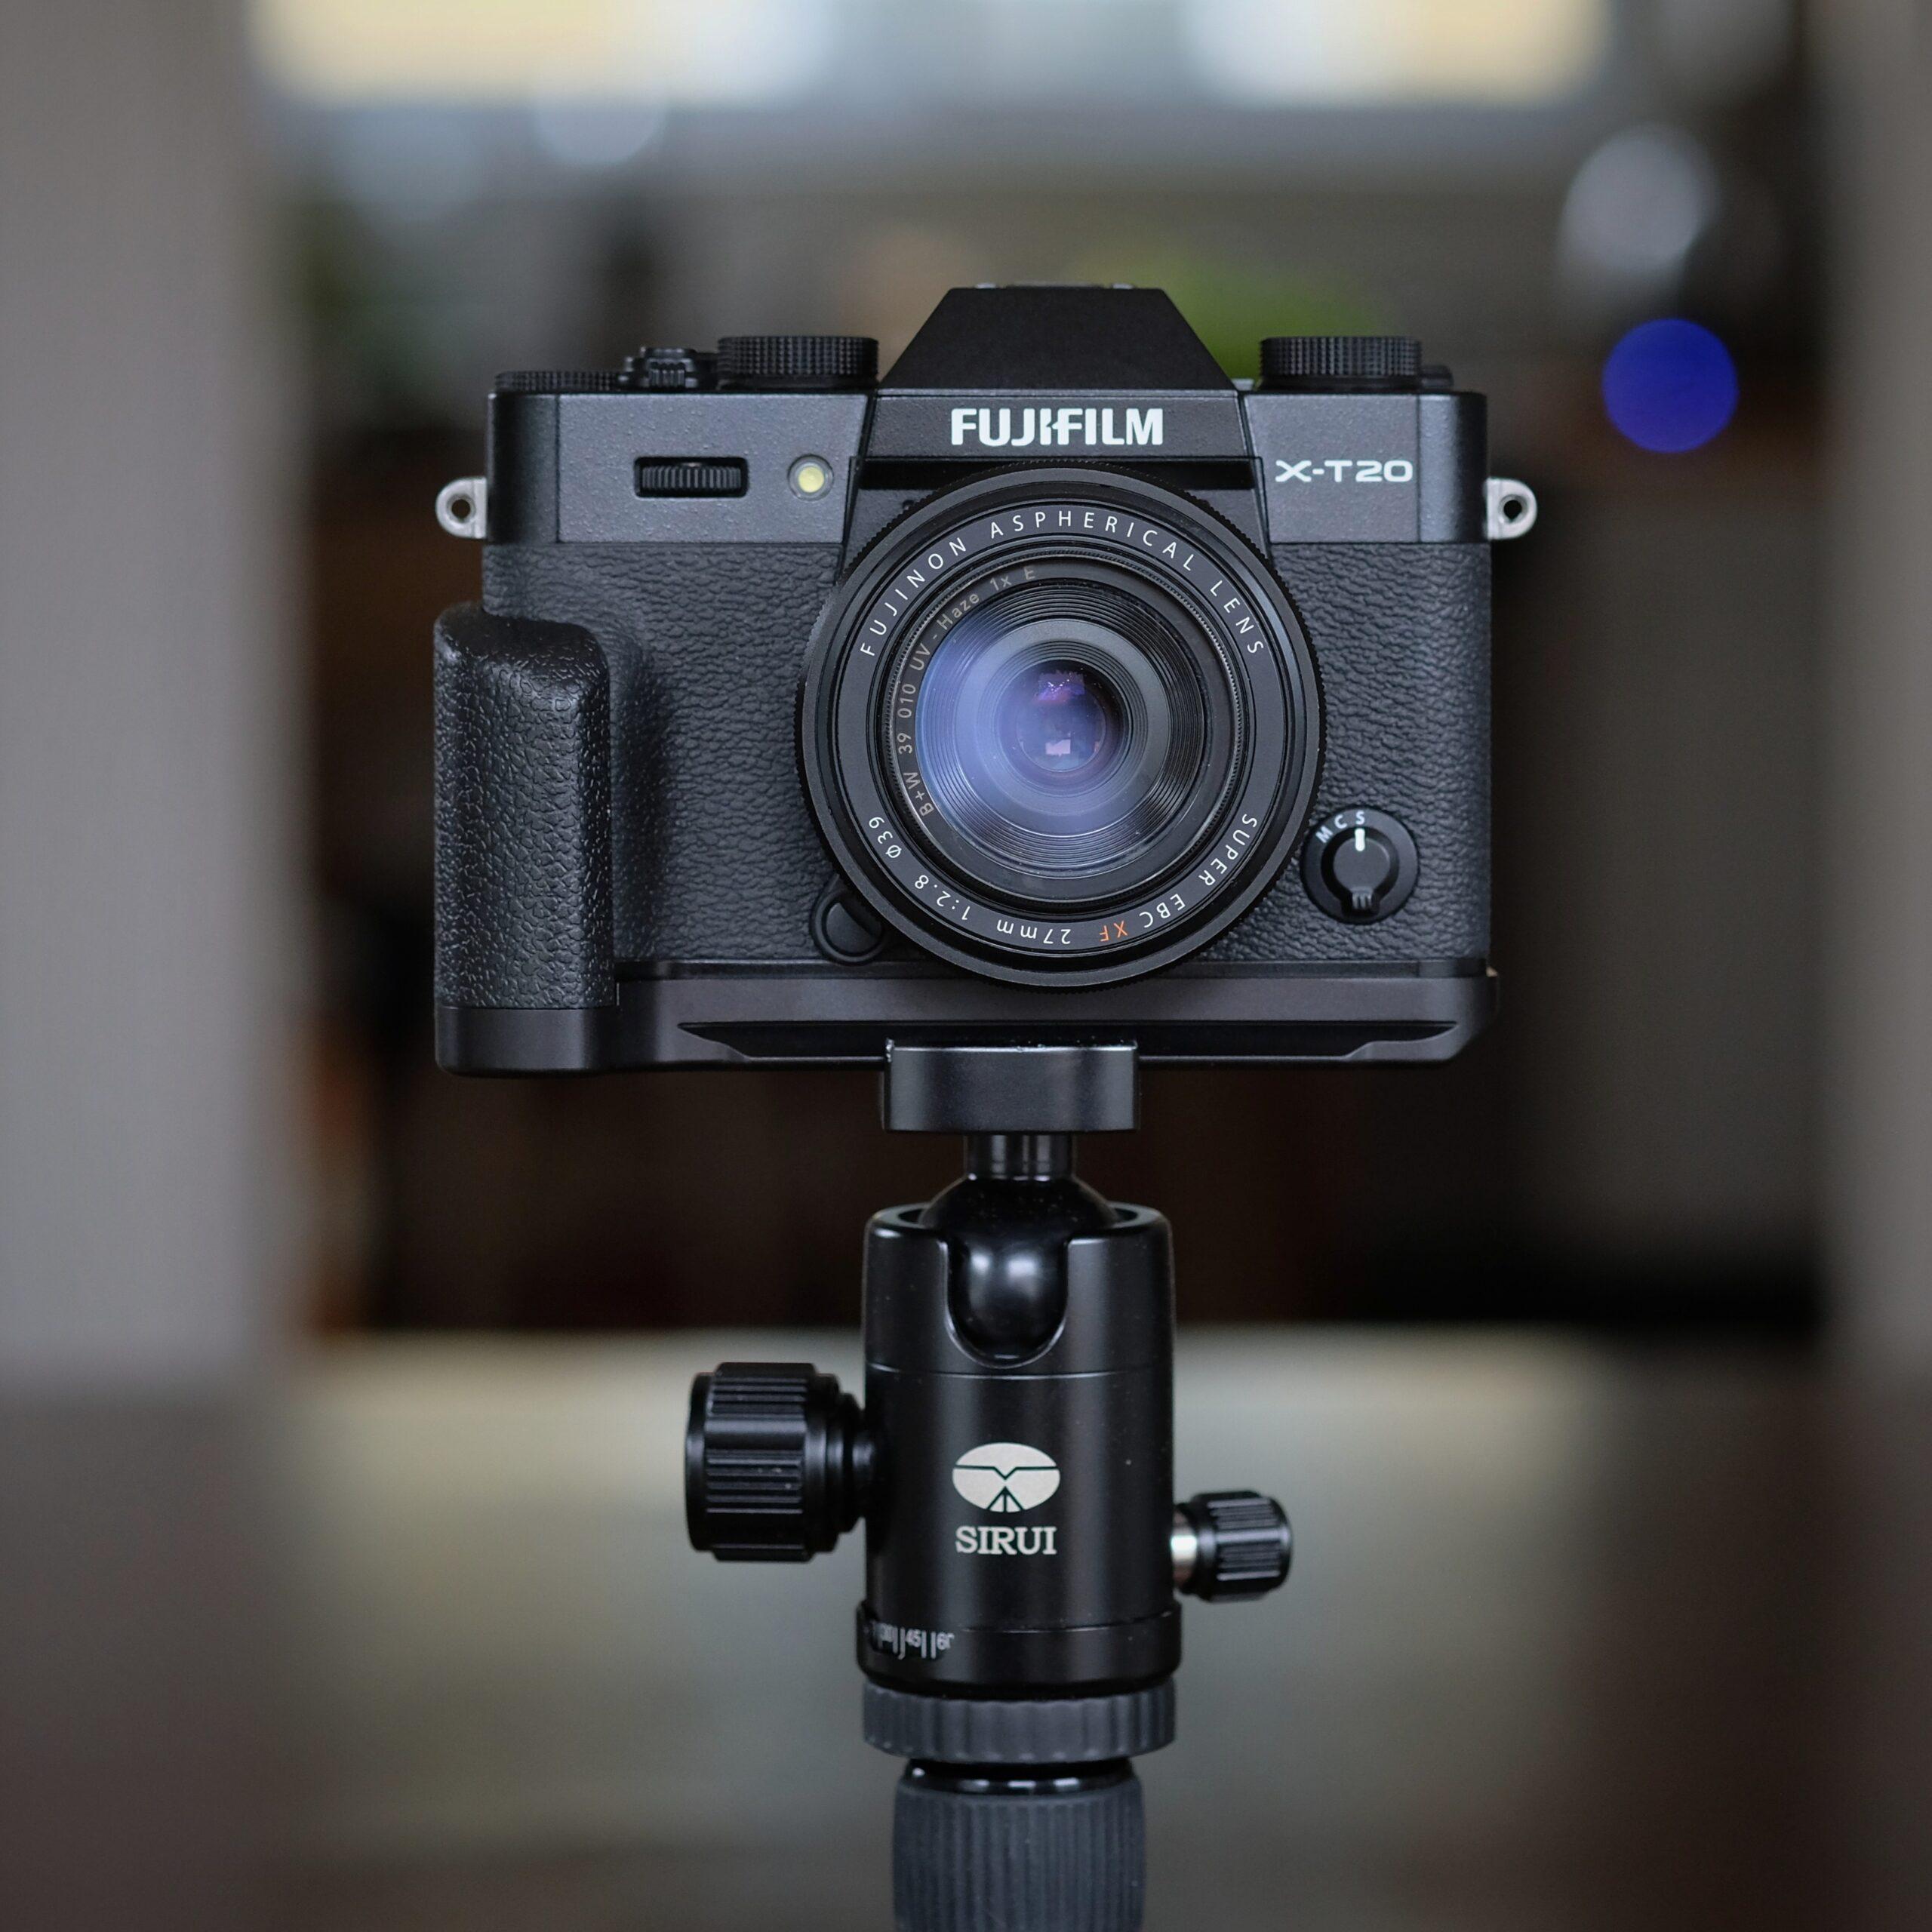 Fujifilm X-T20 Meike XT20G Hand Grip Review